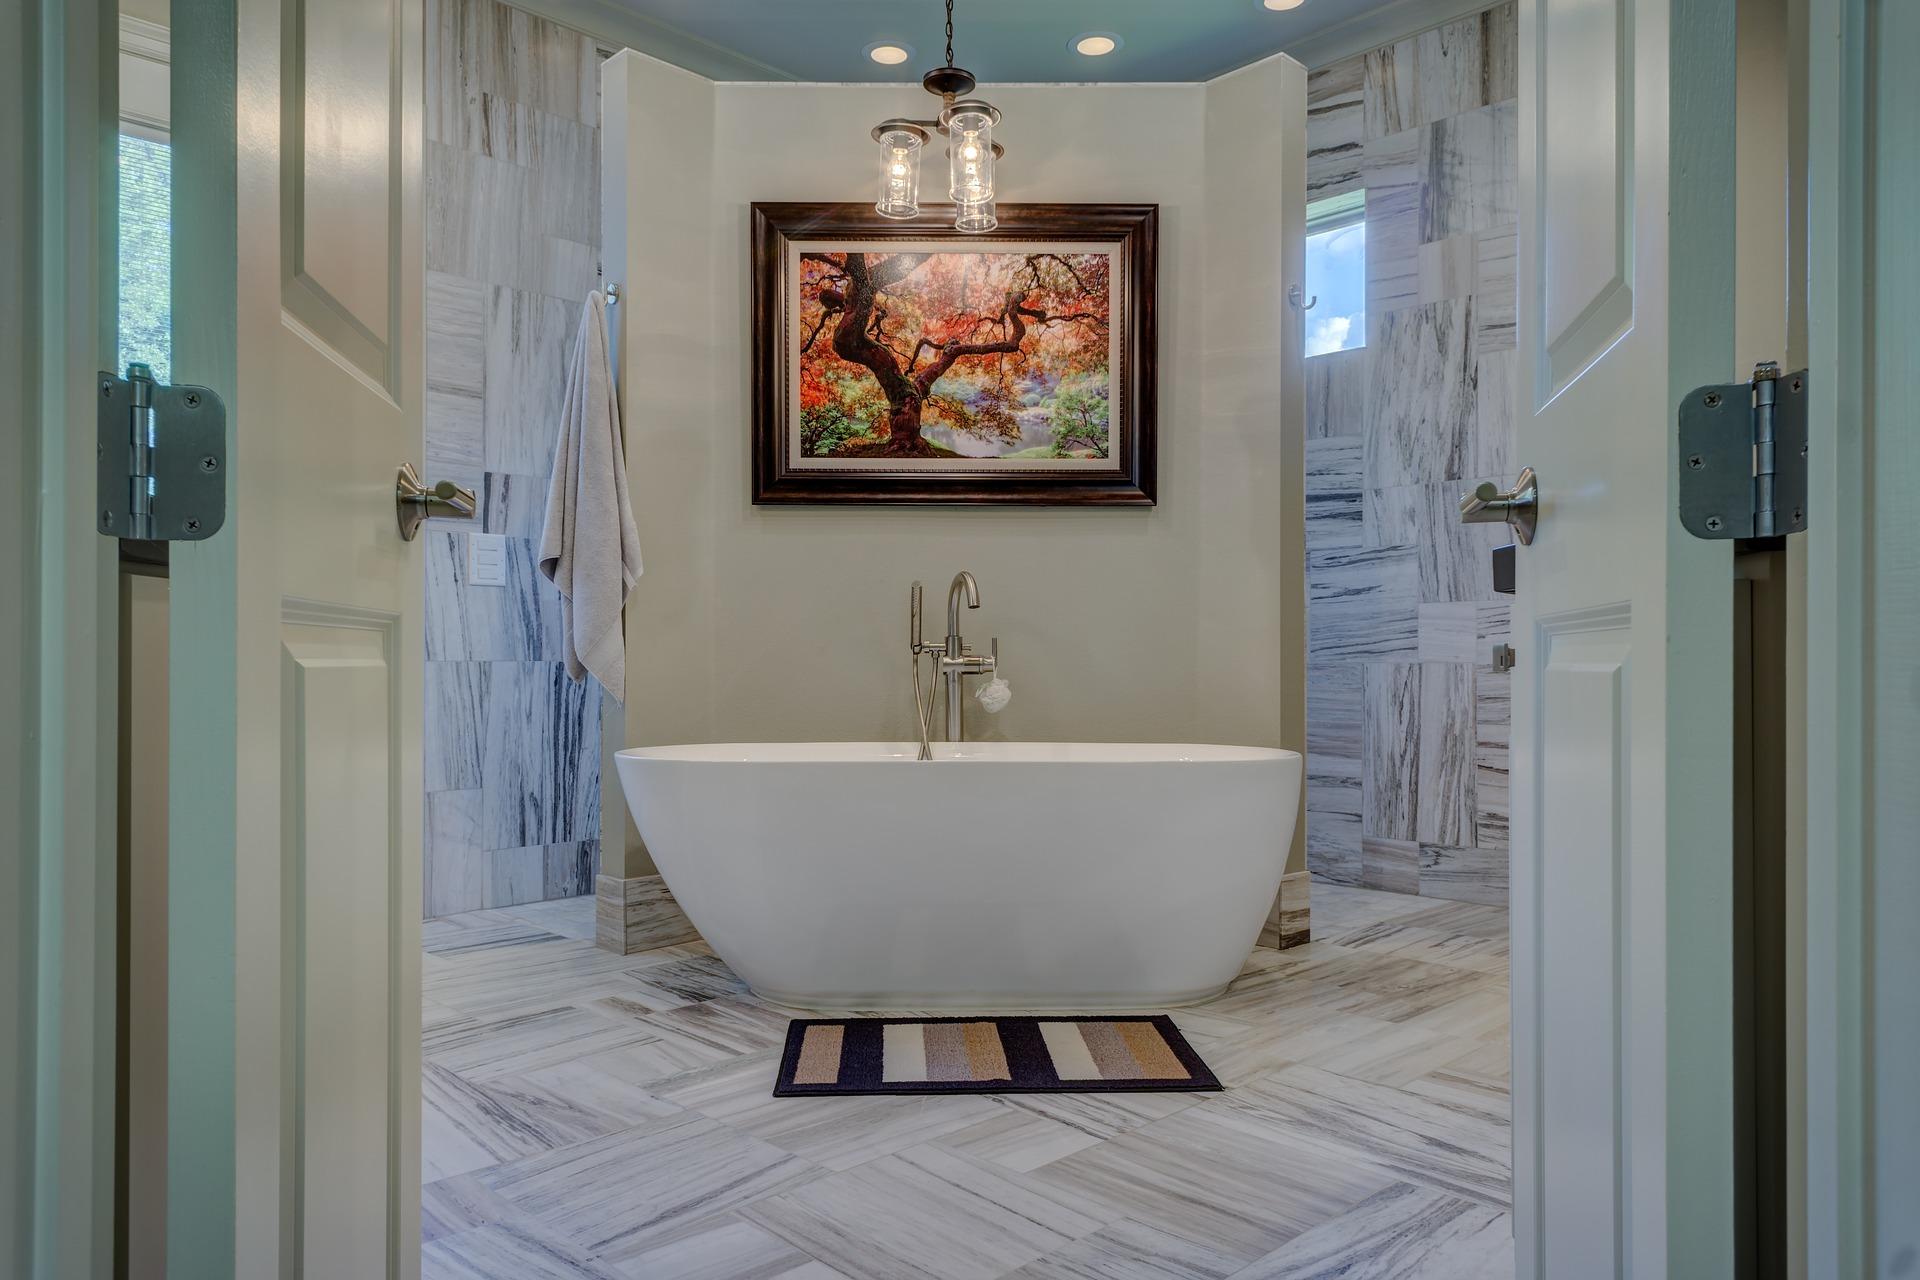 IND plumbing & heating Tetbury Bathroom Design & Installation